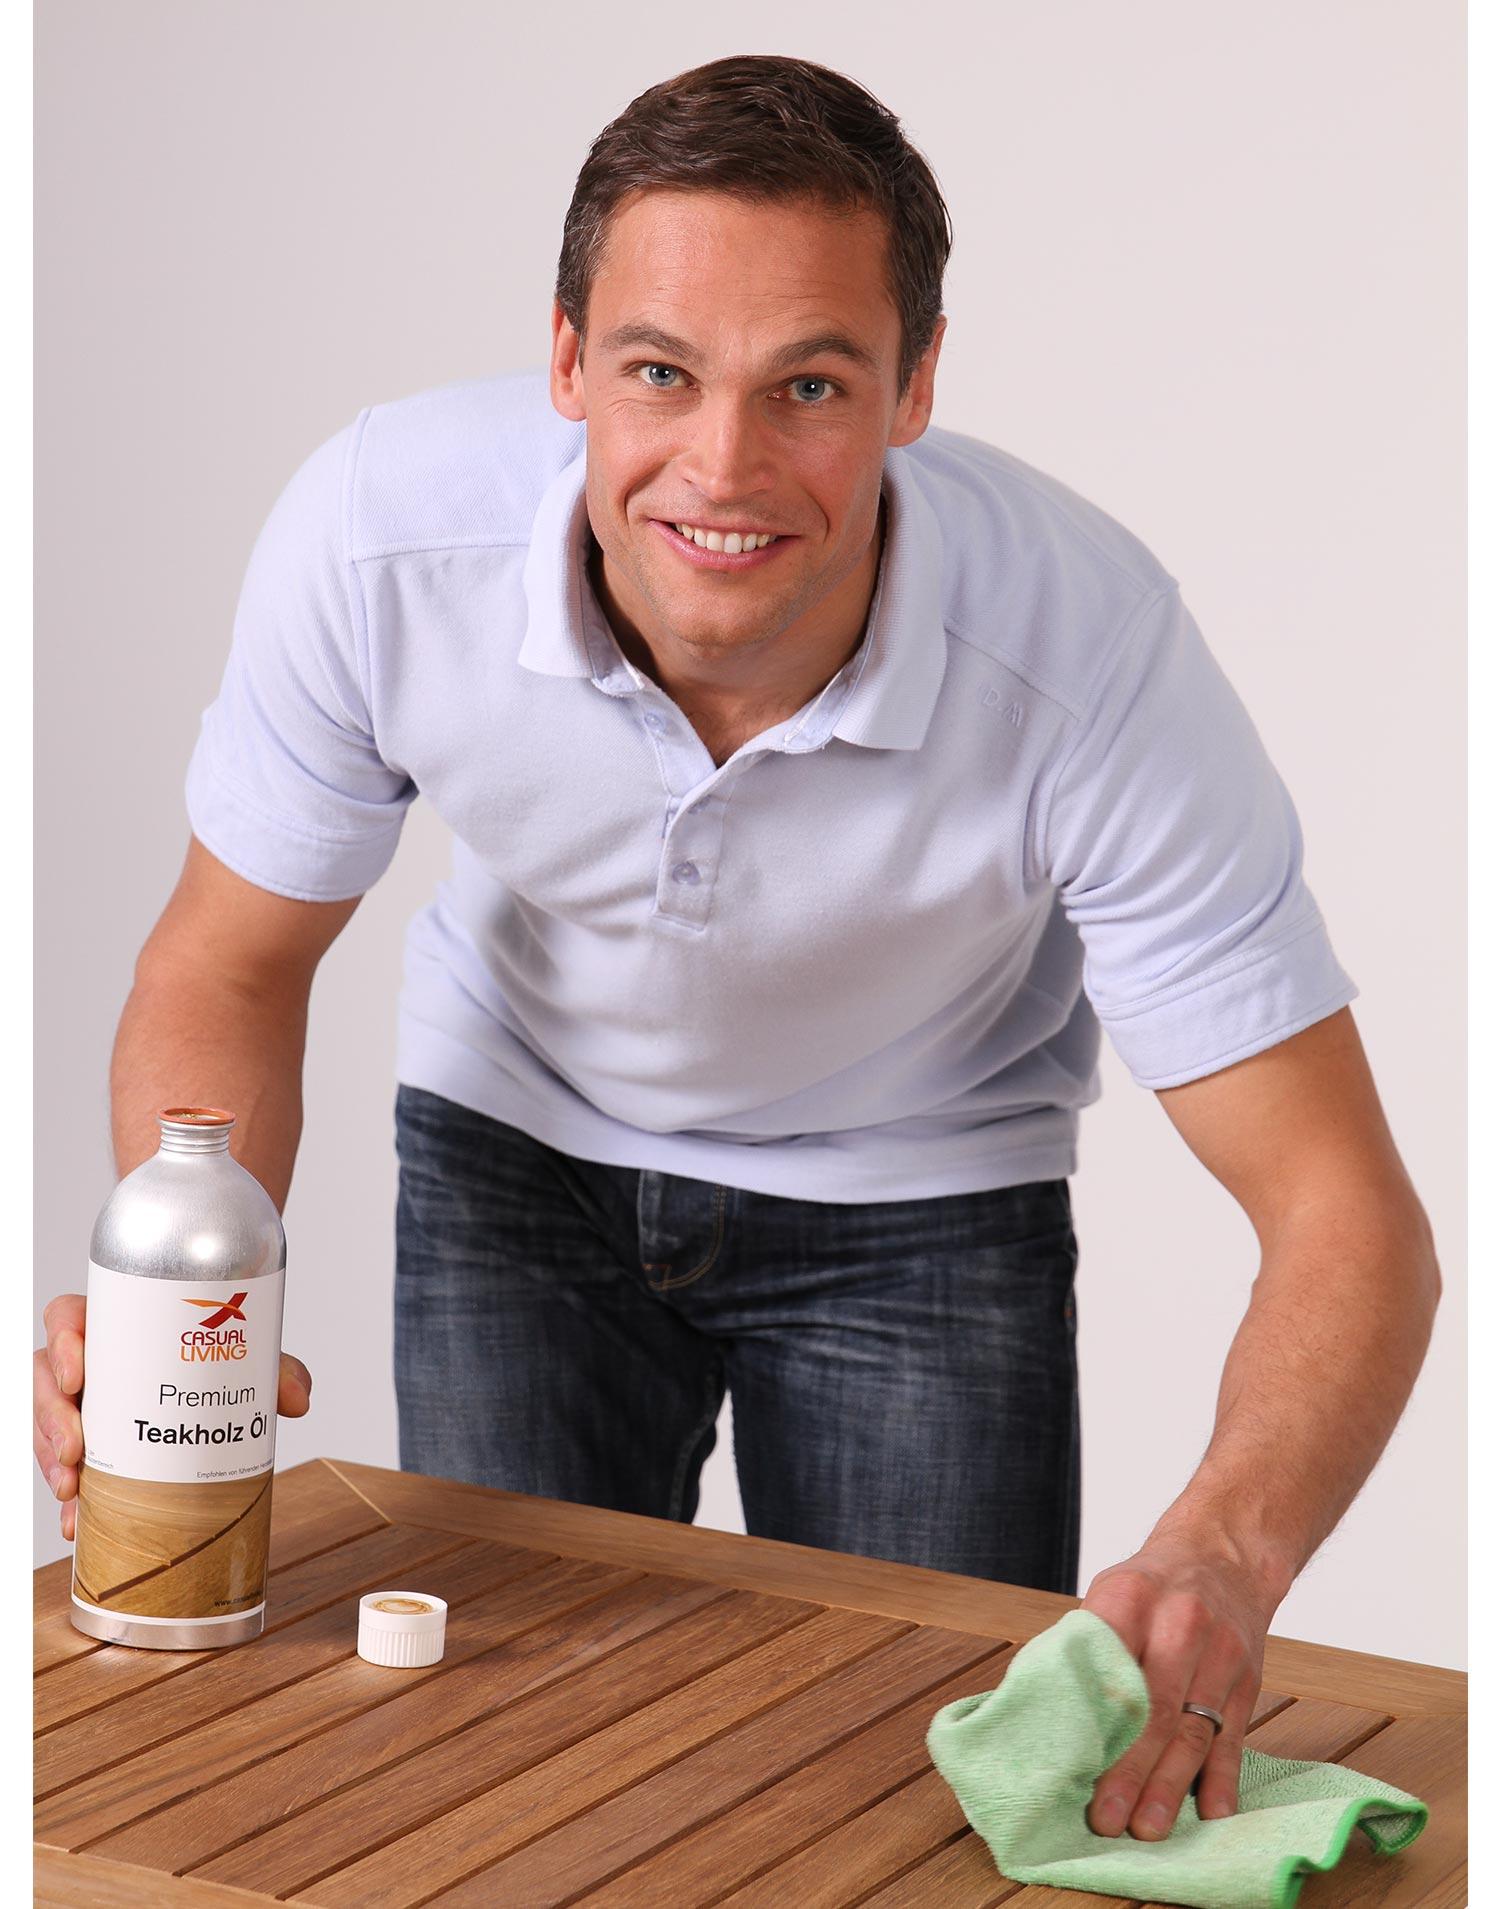 Anvitar.com : Teakholz Gartenmobel Pflege ~> Interessante Ideen ... Schutz Pflegetipps Holz